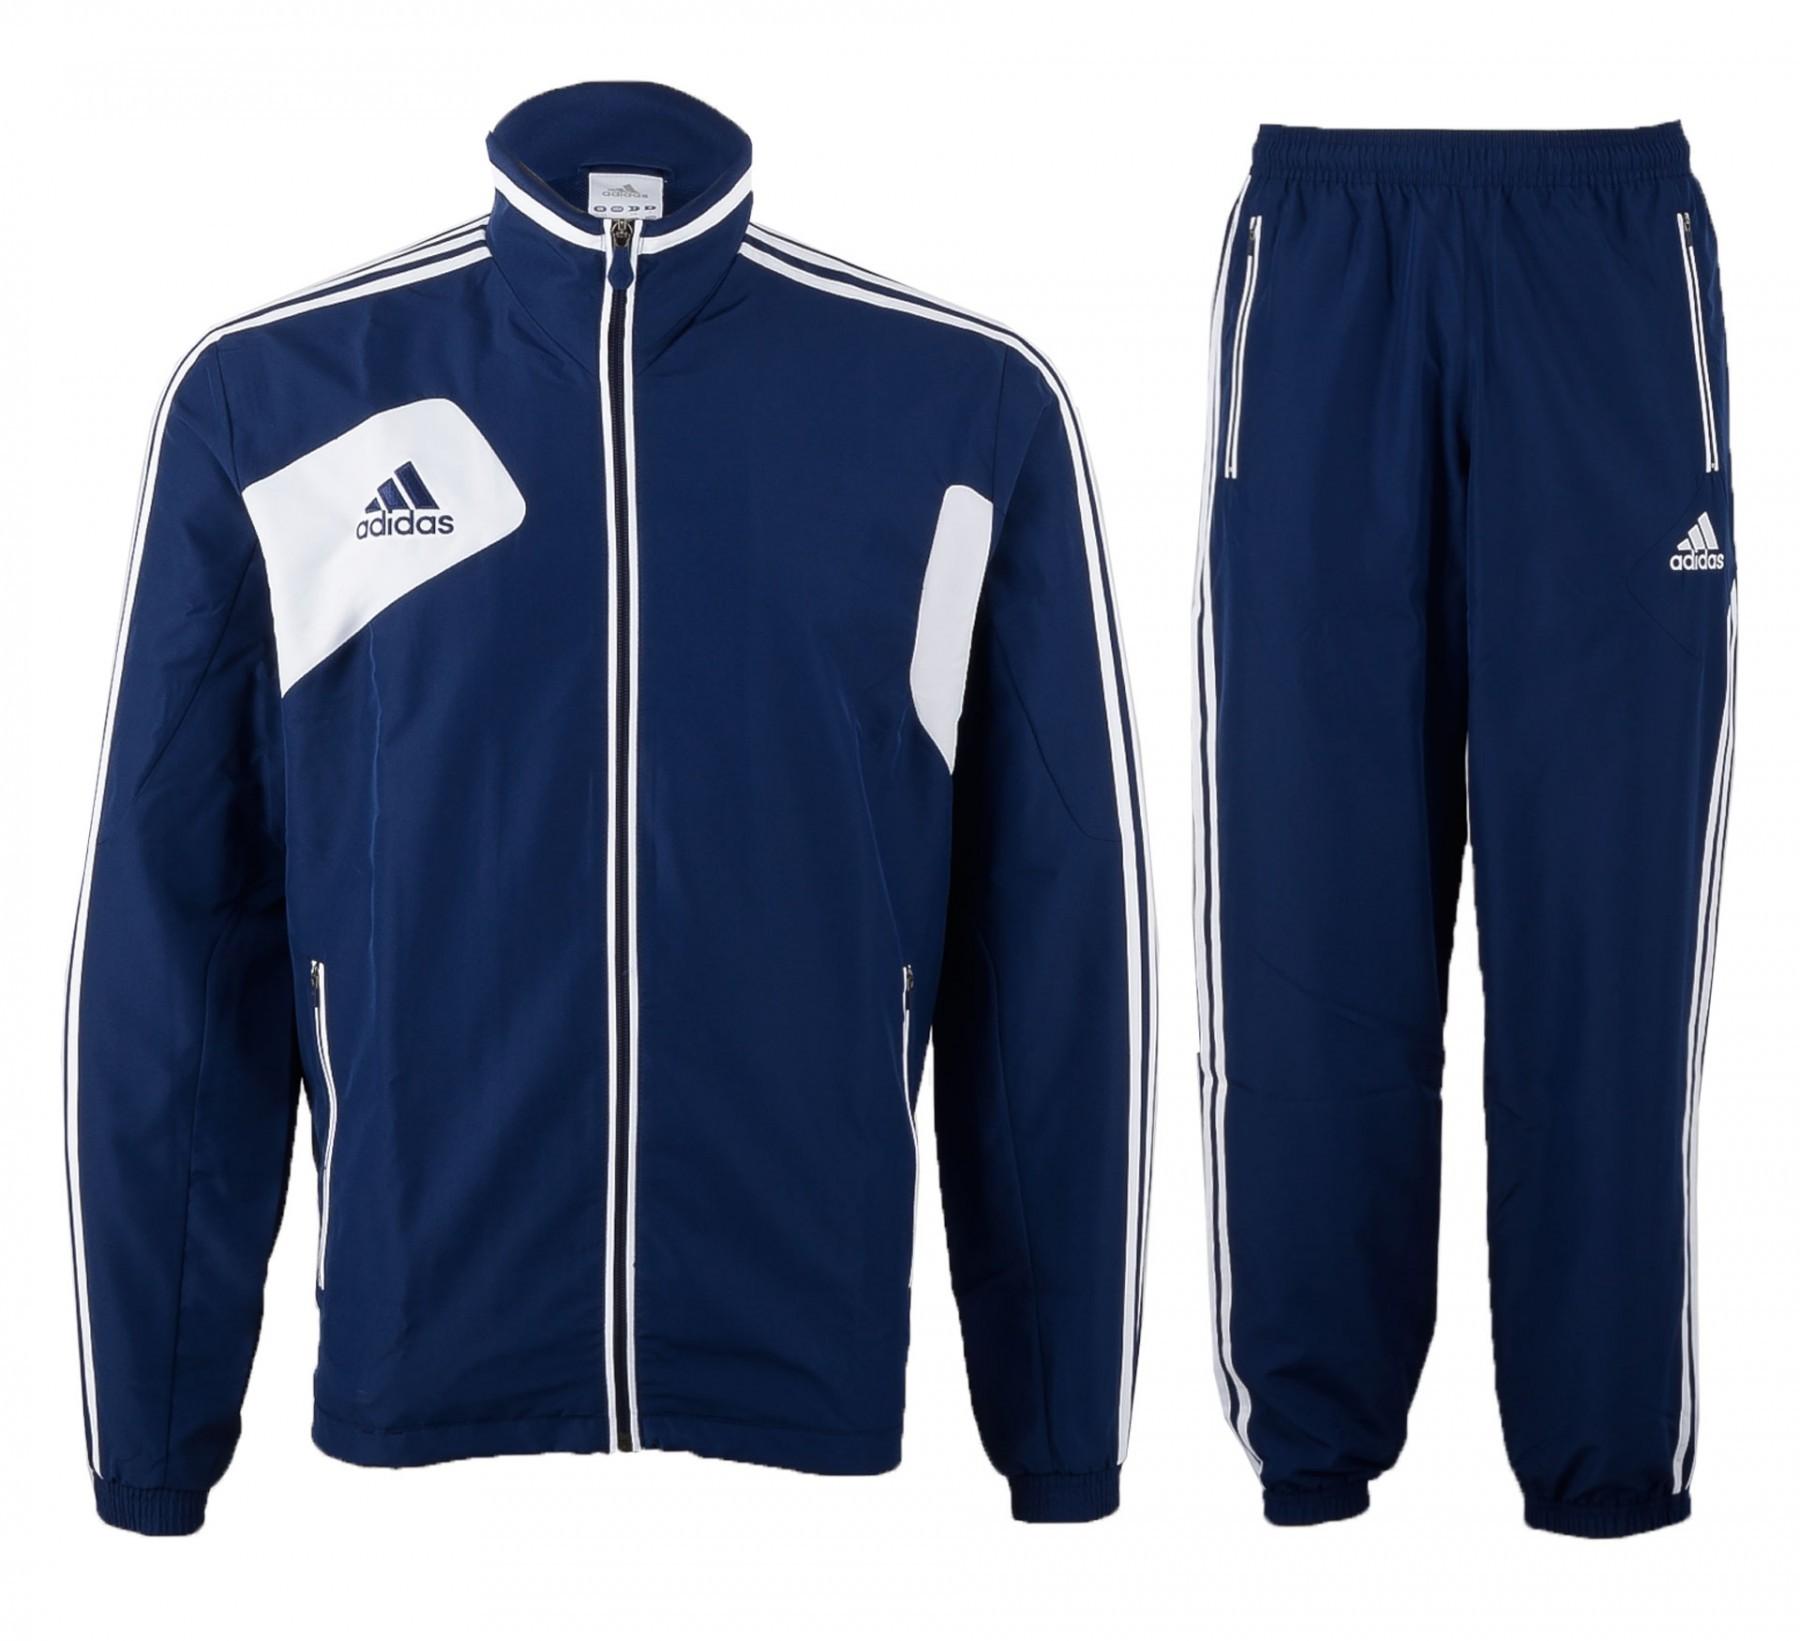 Adidas Condivo 12 Blue/White Tracksuit